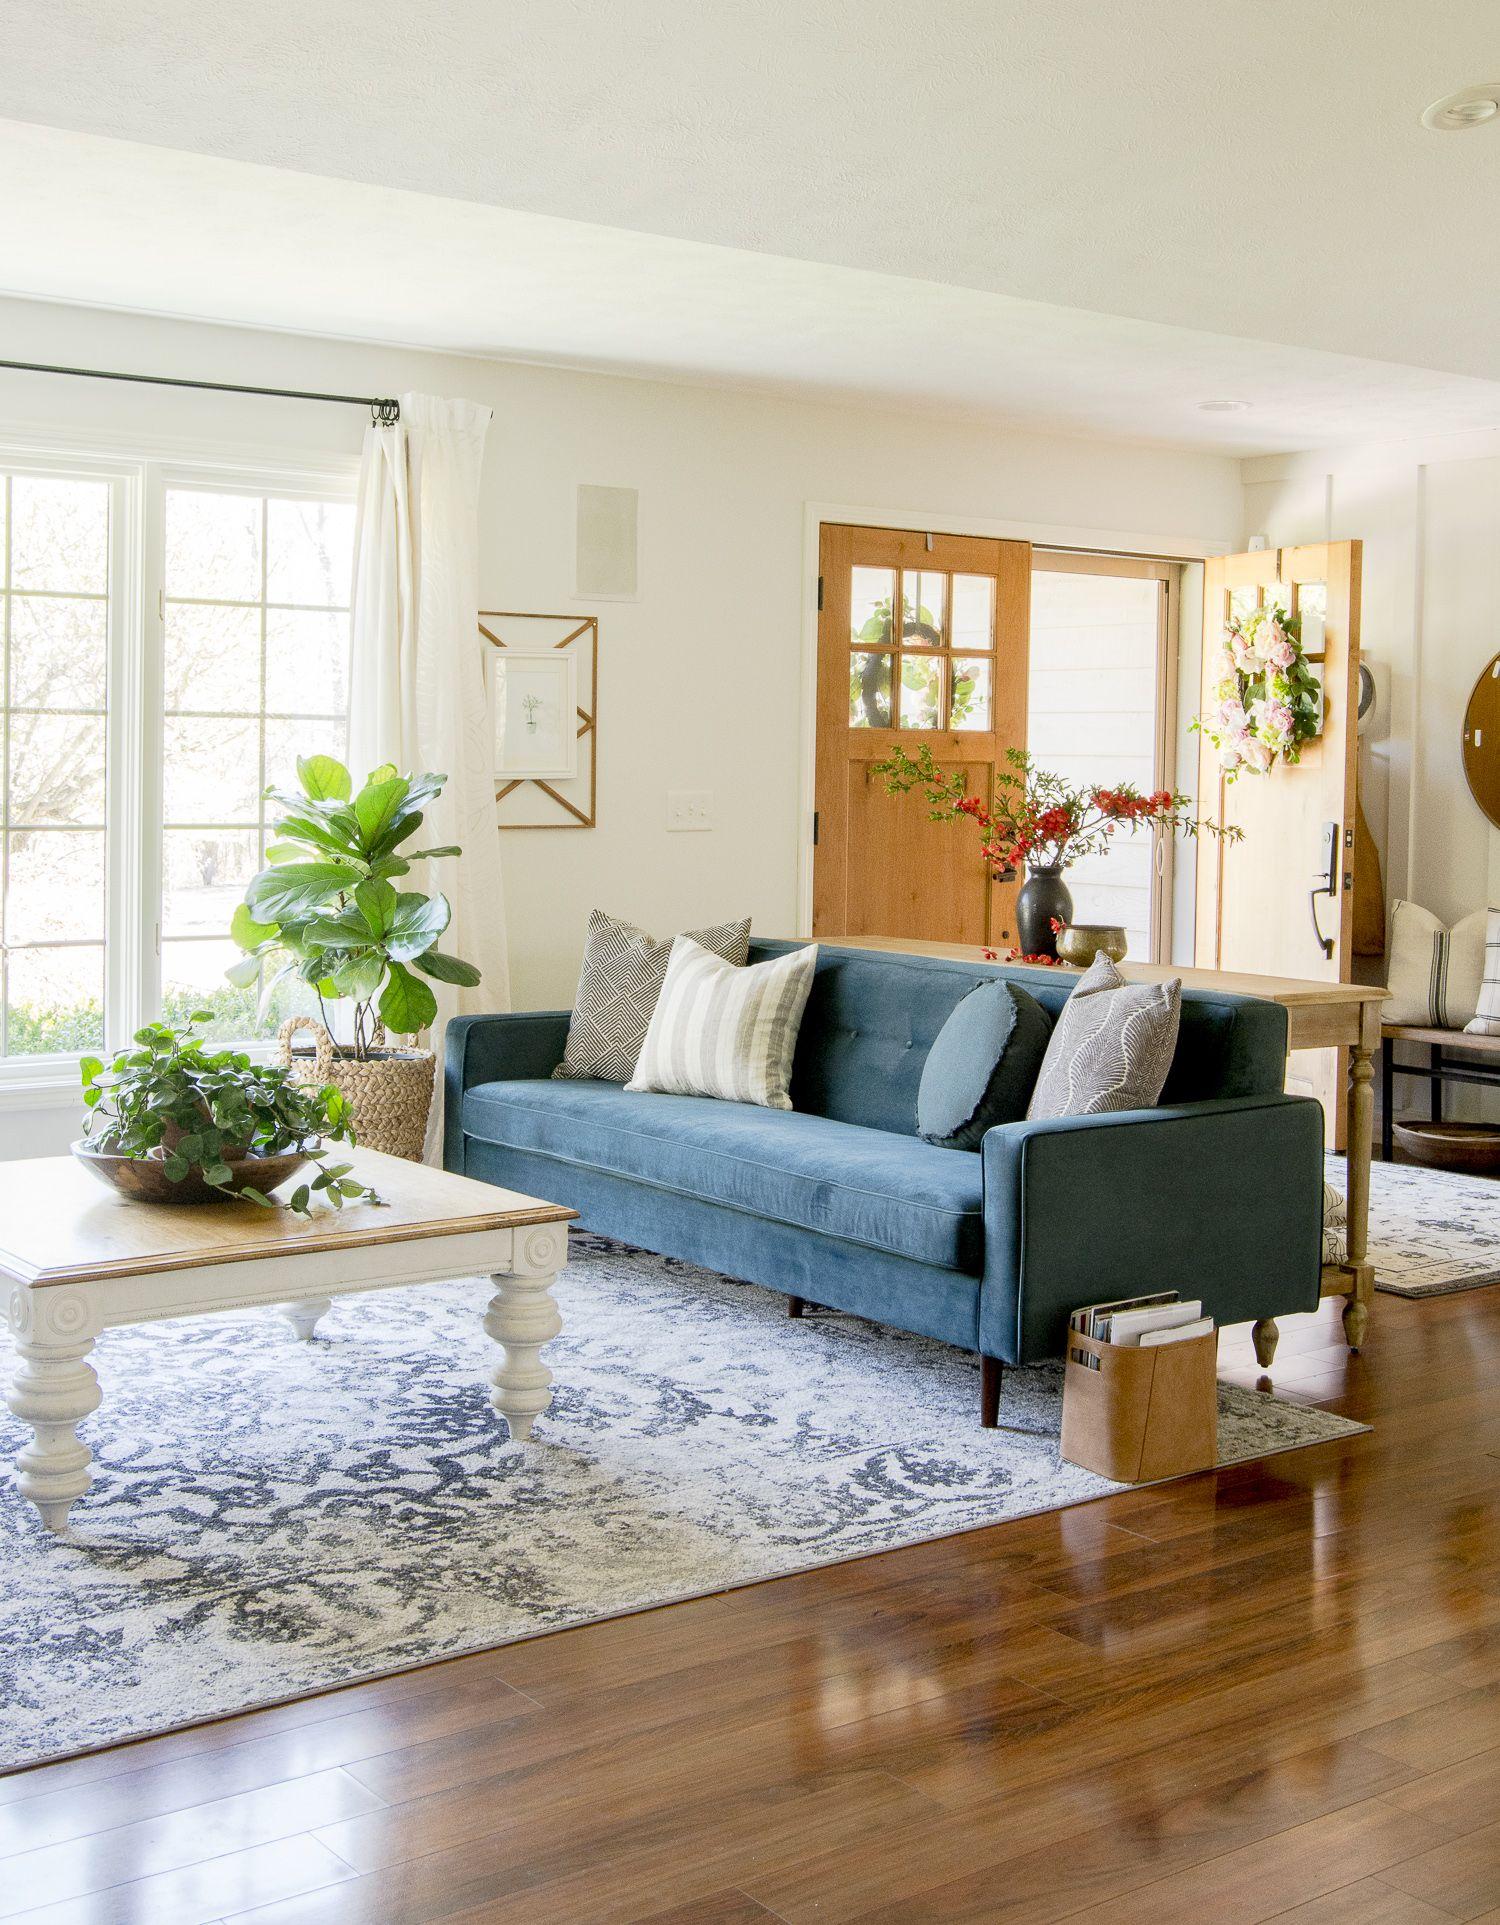 Modern Bohemian Style Summer Living Room Tour In 2020 Summer Living Room Modern Vintage Decor Modern Boho Living Room #simple #boho #living #room